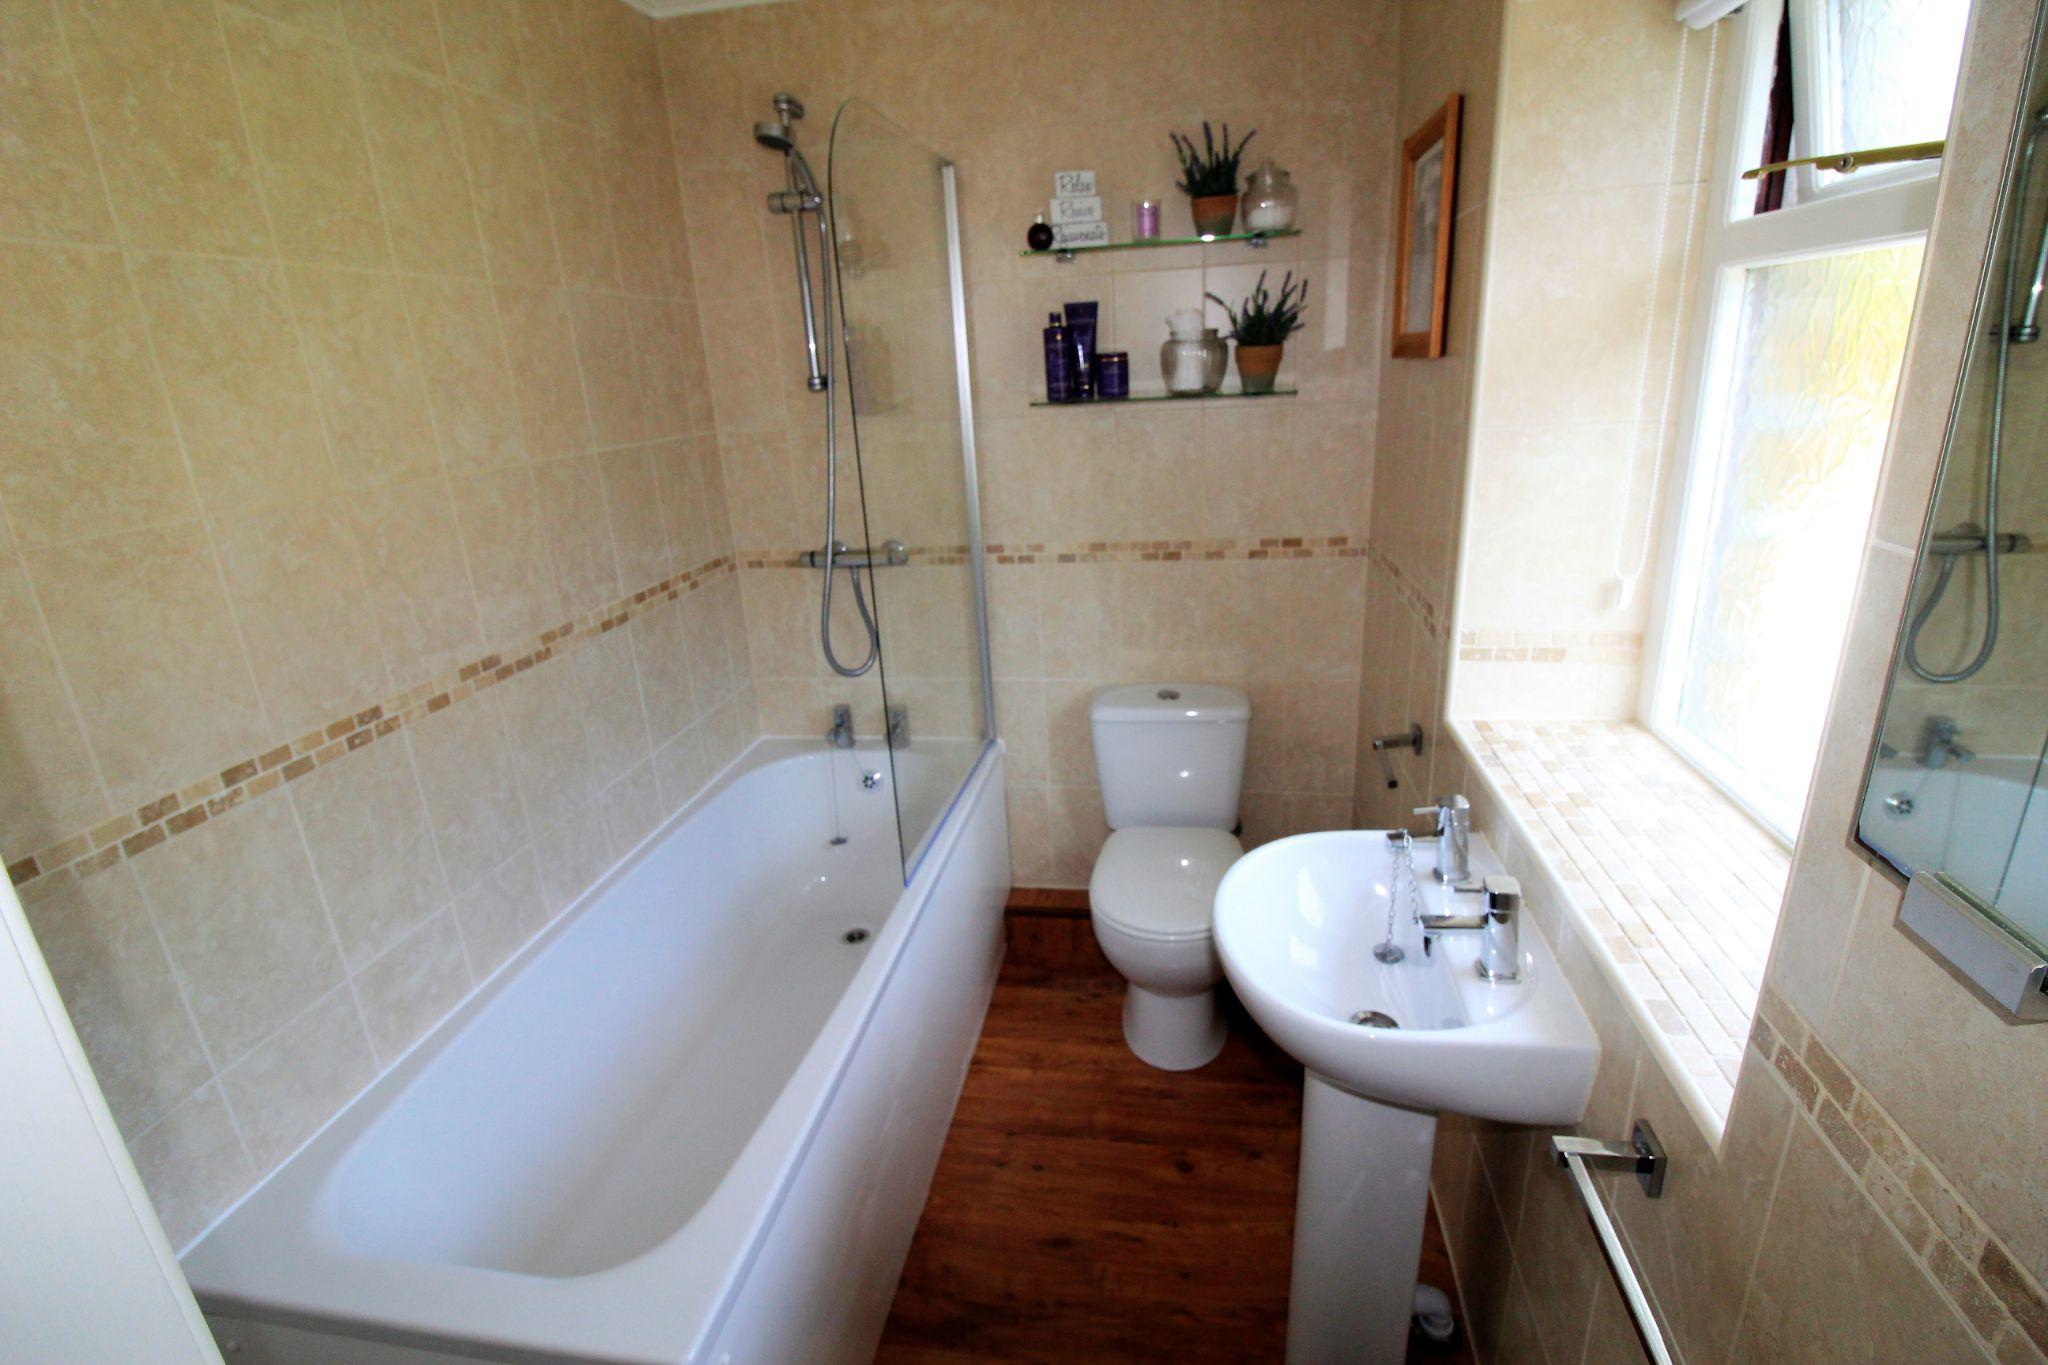 2 bedroom cottage house SSTC in Huddersfield - Bathroom